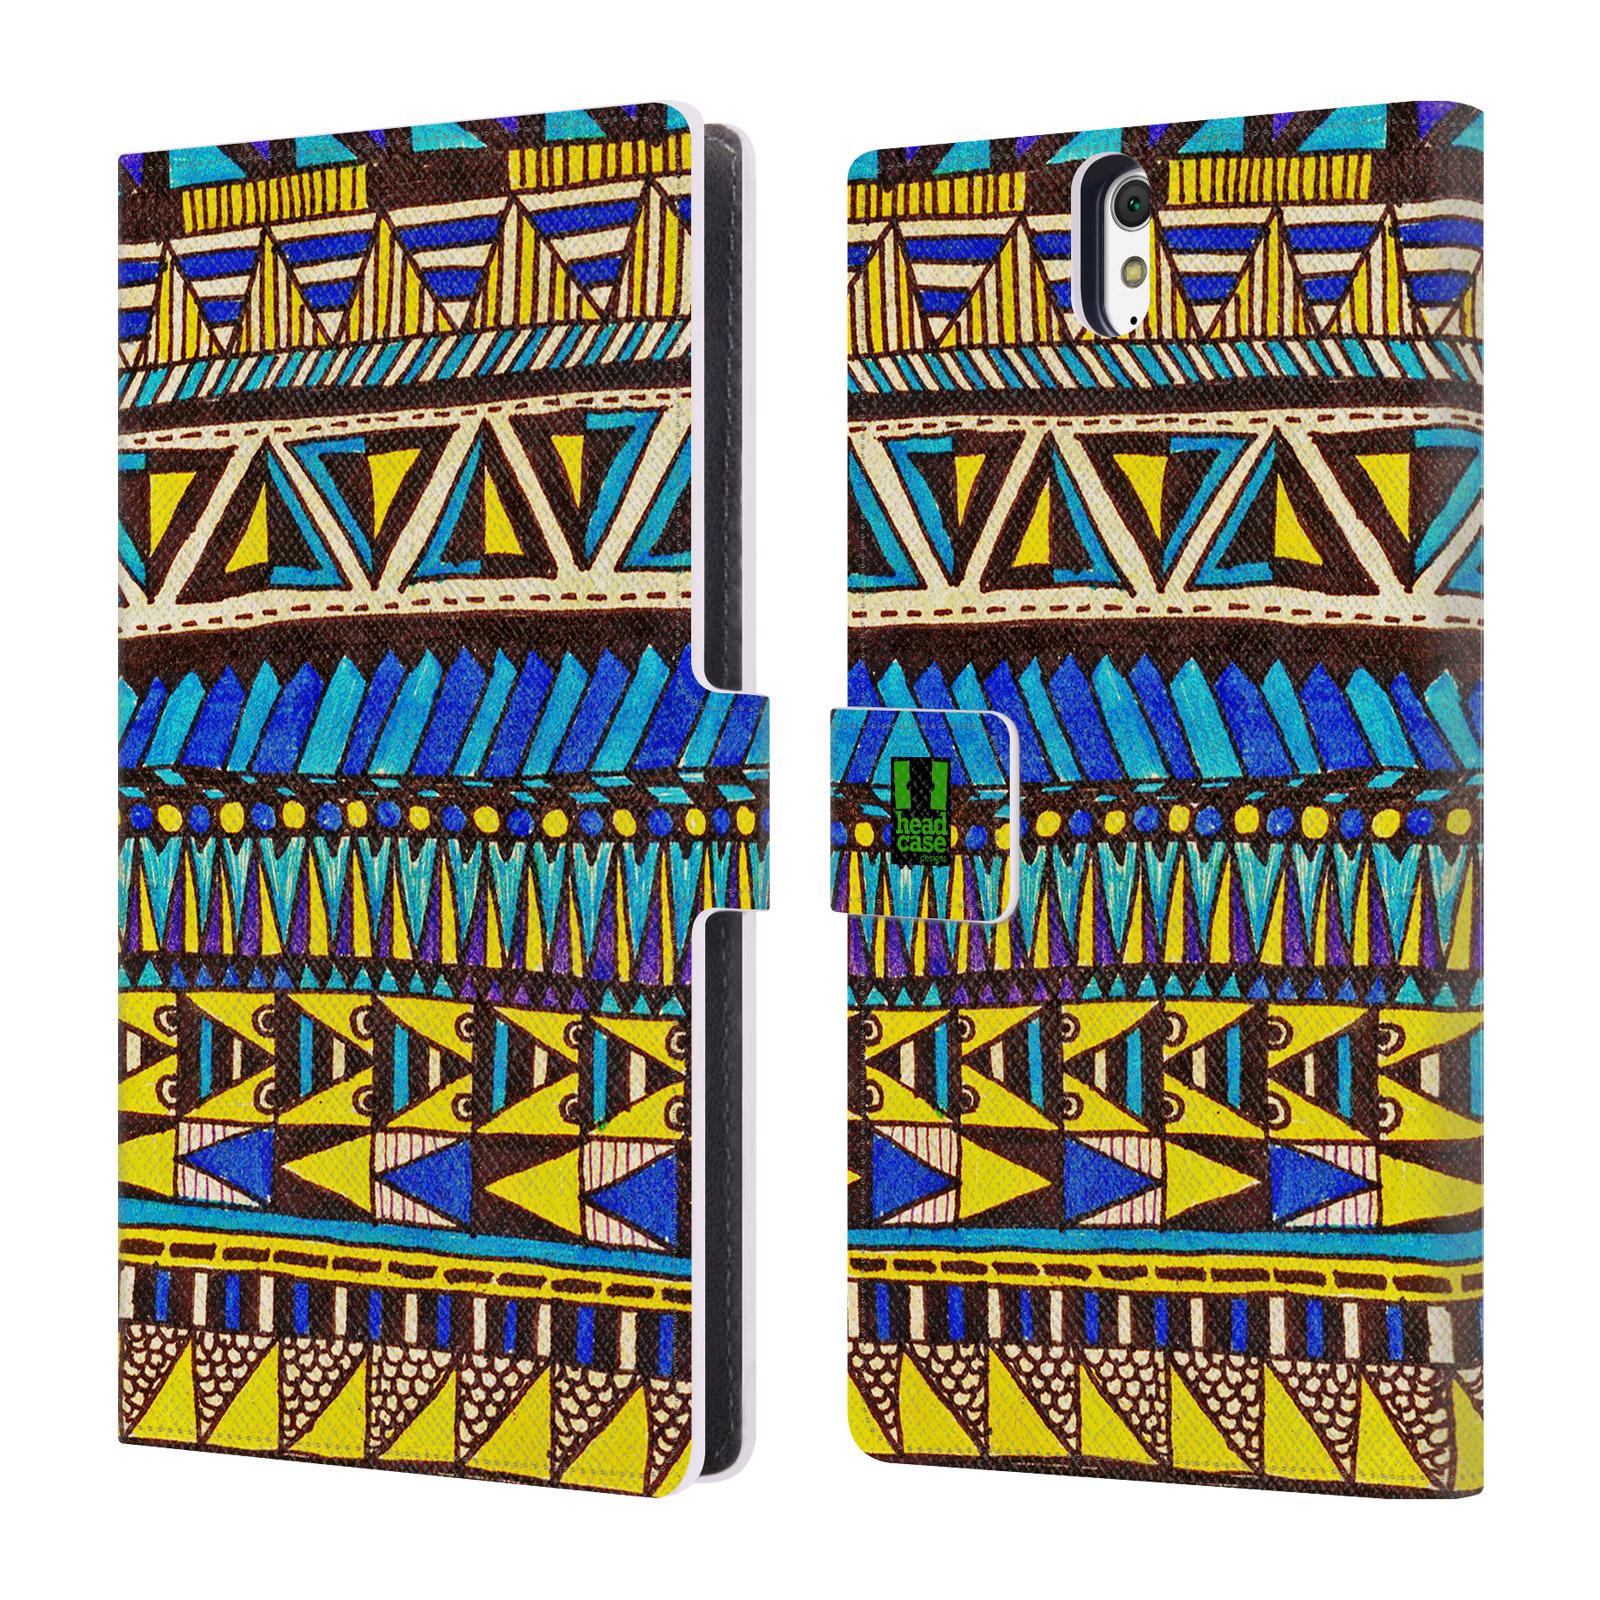 HEAD CASE Flipové pouzdro pro mobil SONY XPERIA C5 Ultra Barevná aztécká čmáranice modrá